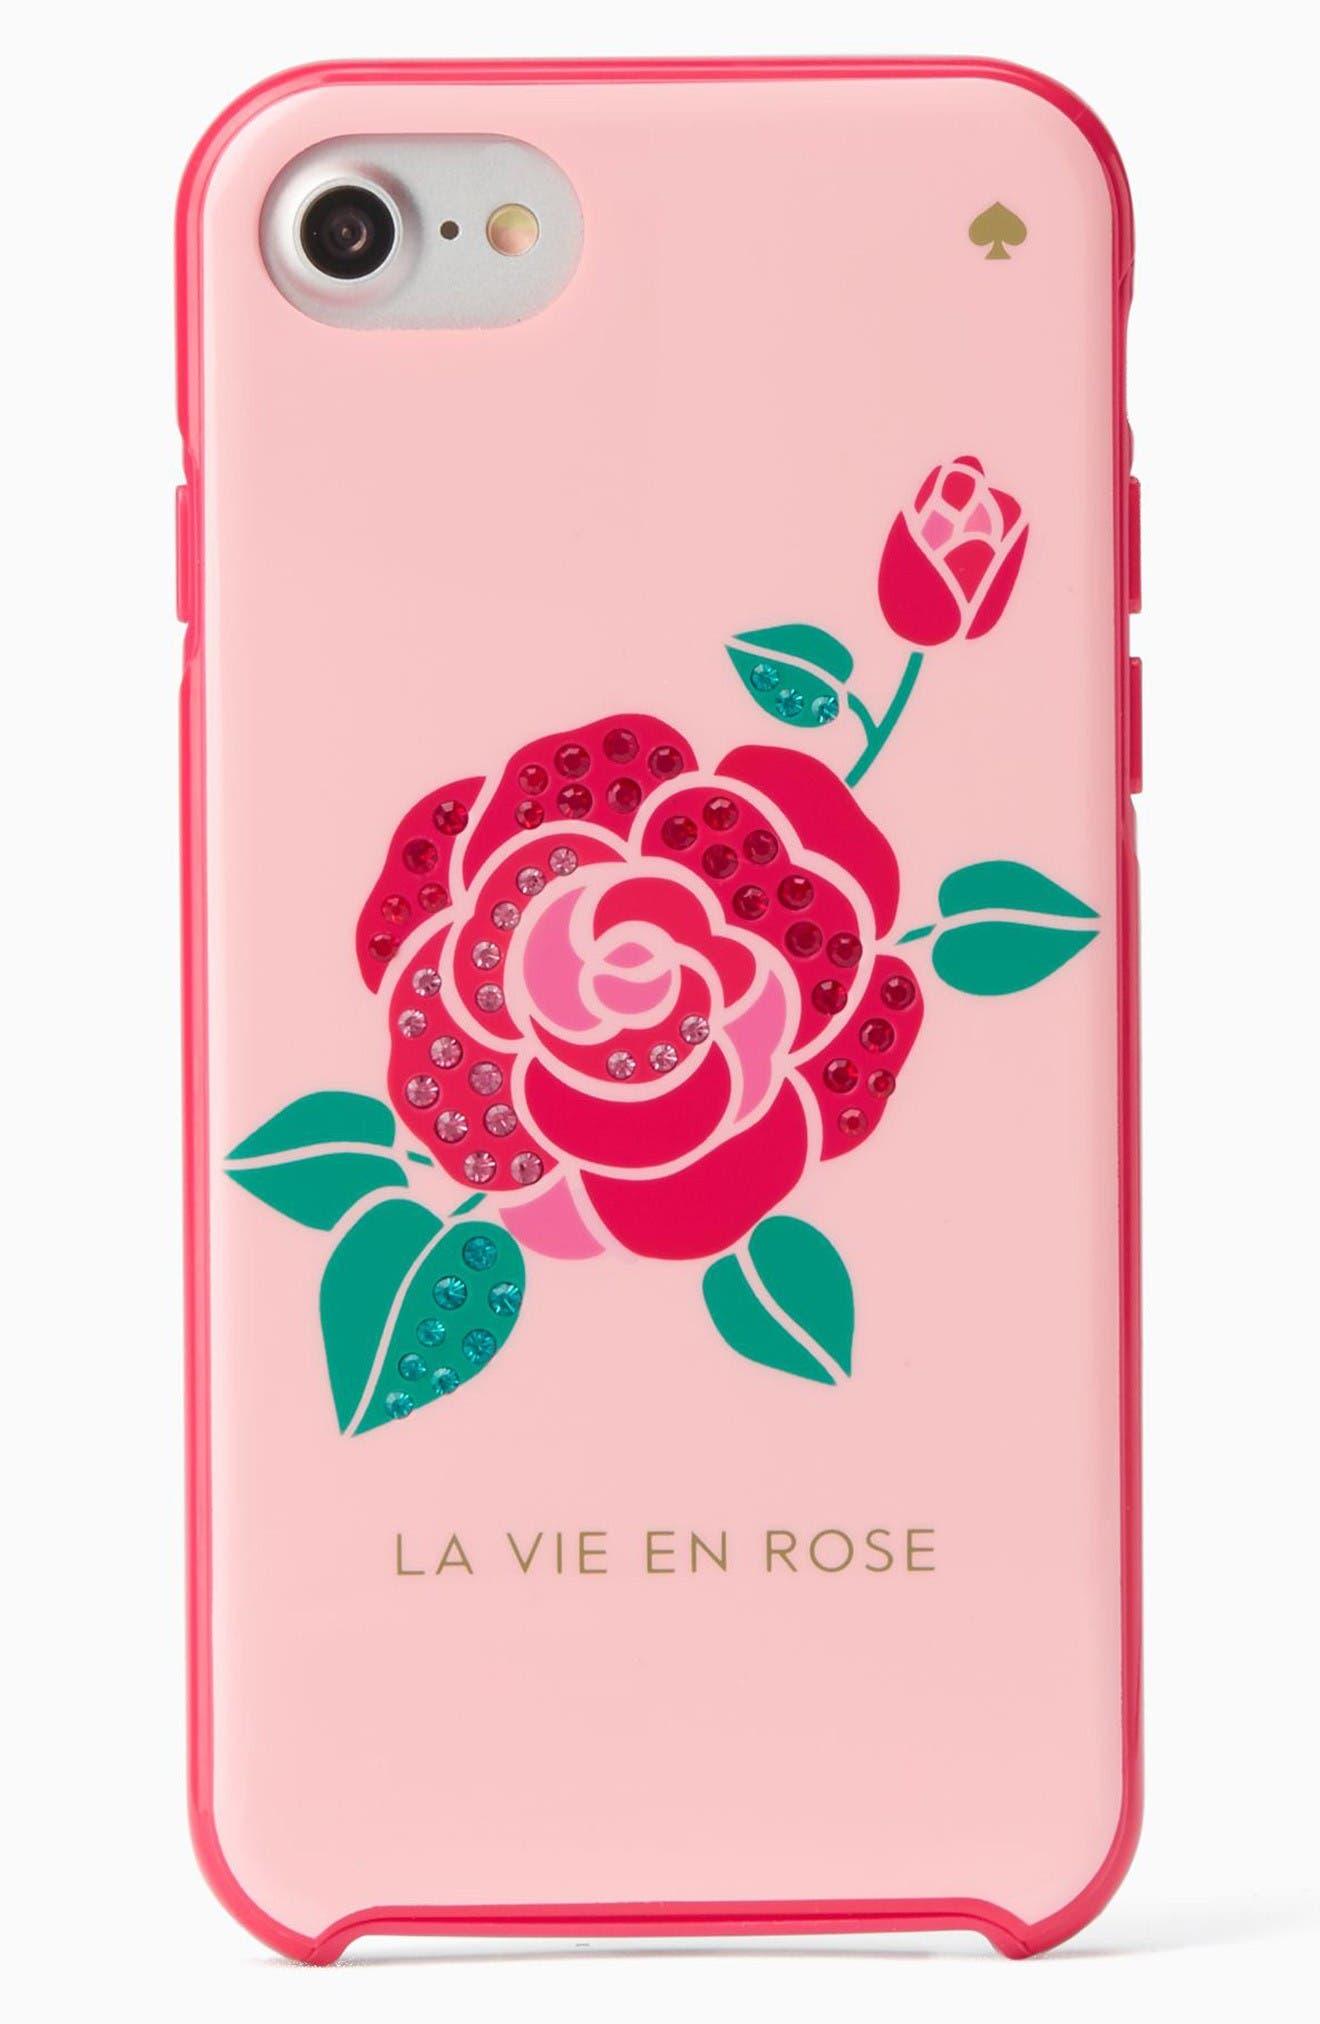 Main Image - kate spade new york la vie en rose iPhone 7 & 7 Plus case